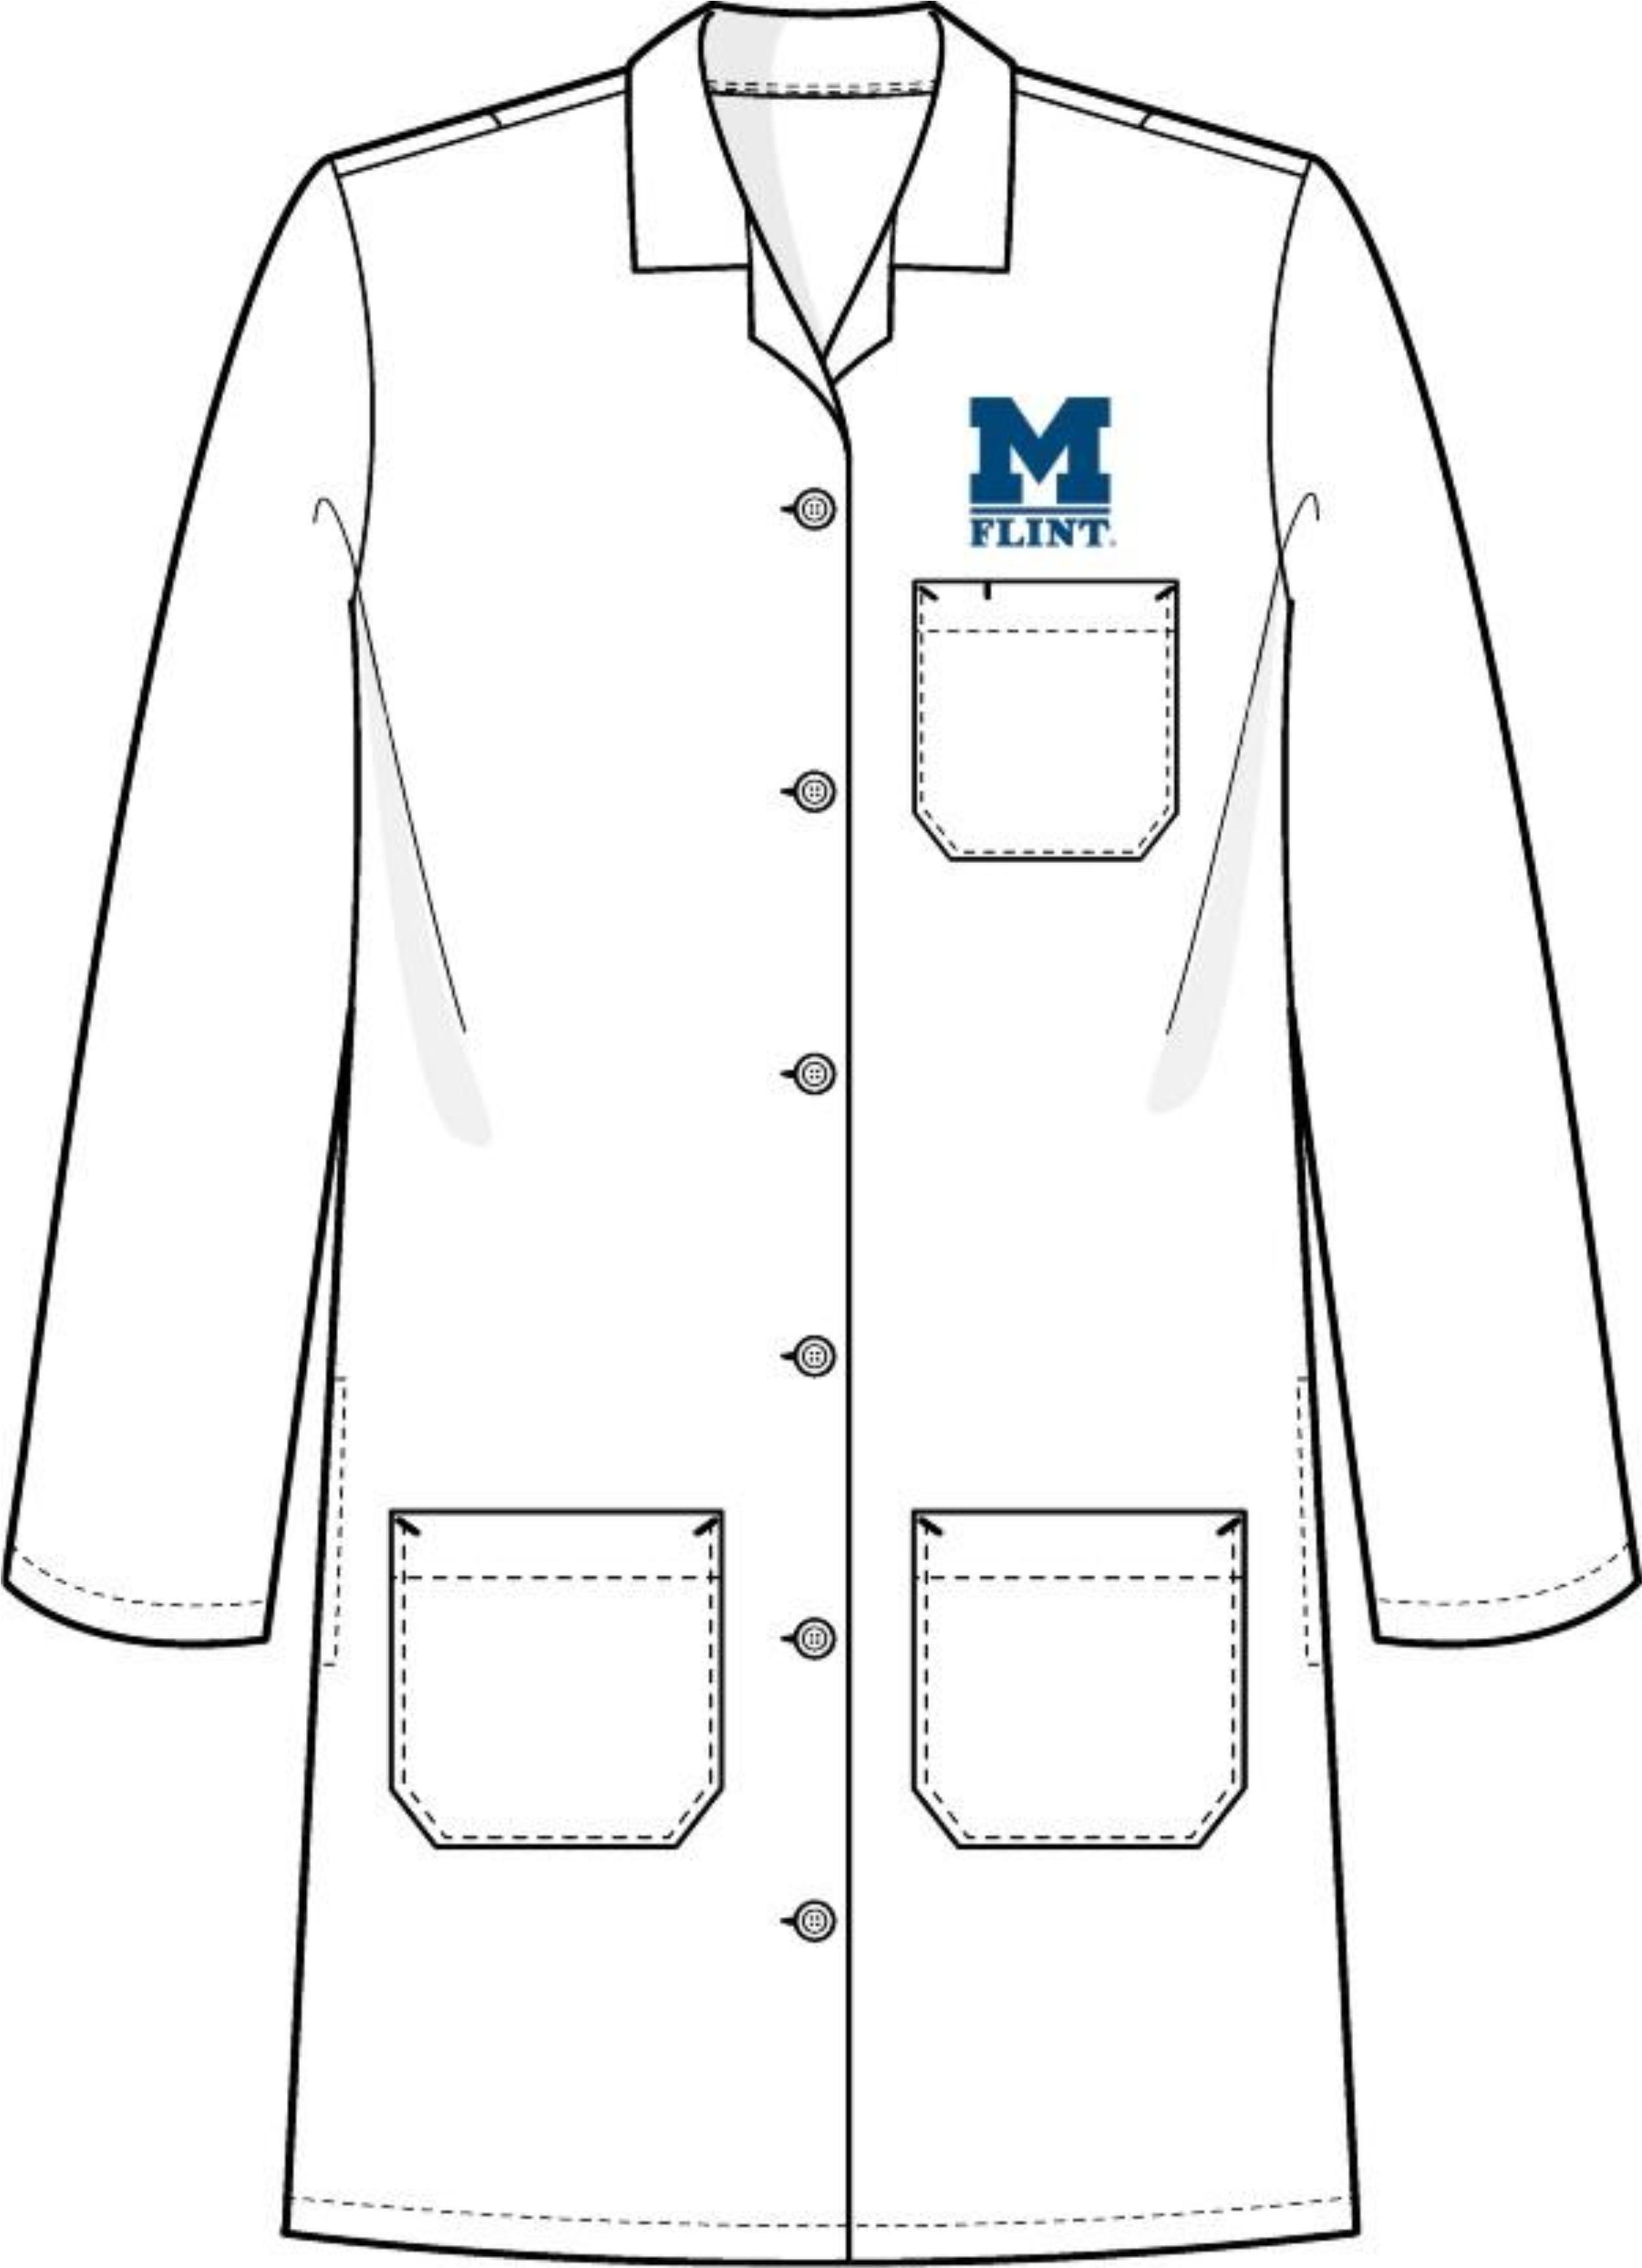 Science lab coat clipart.